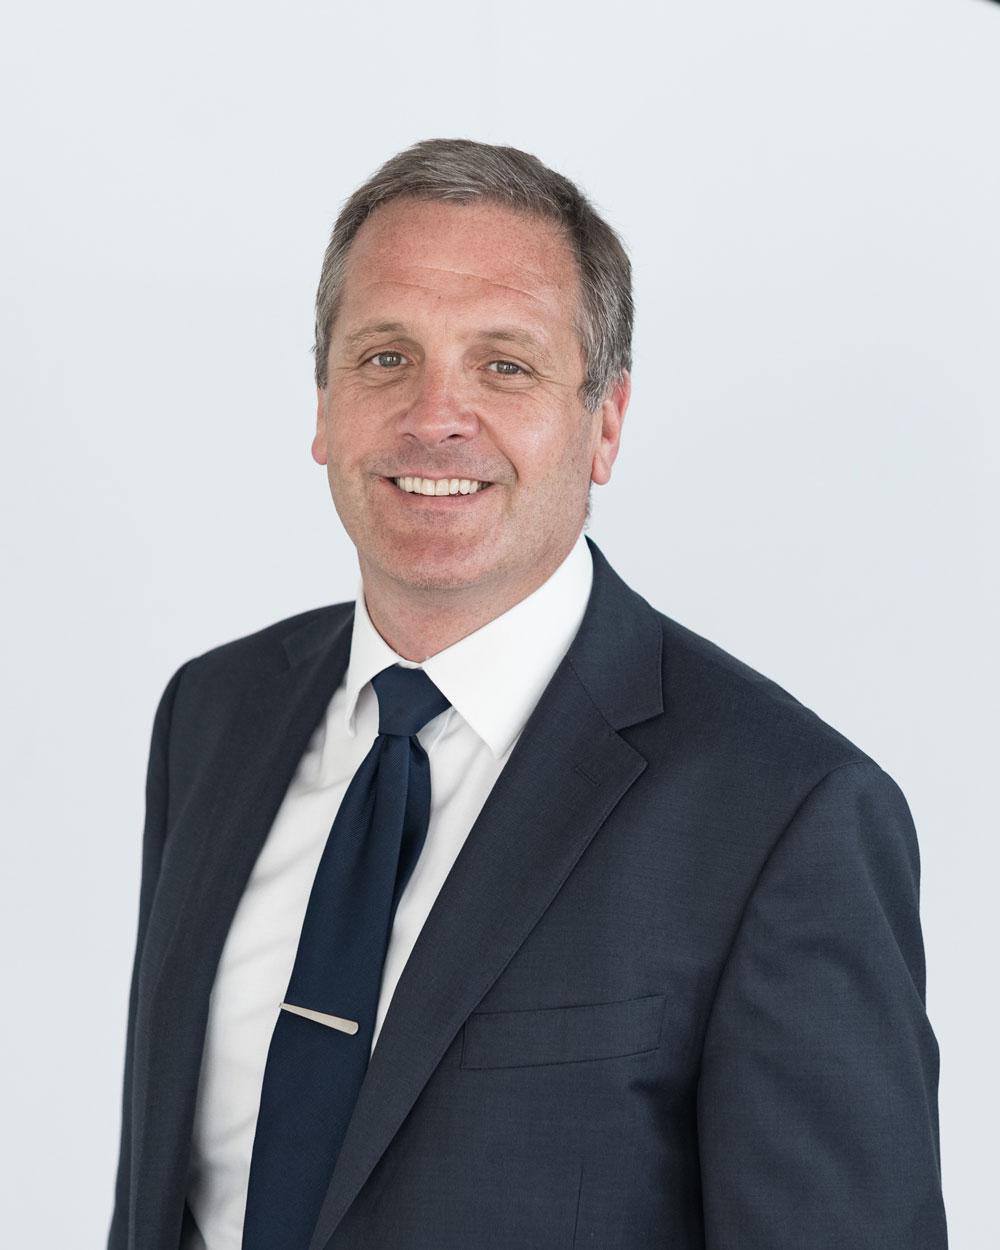 Lender hits £100m milestone in the Midlands